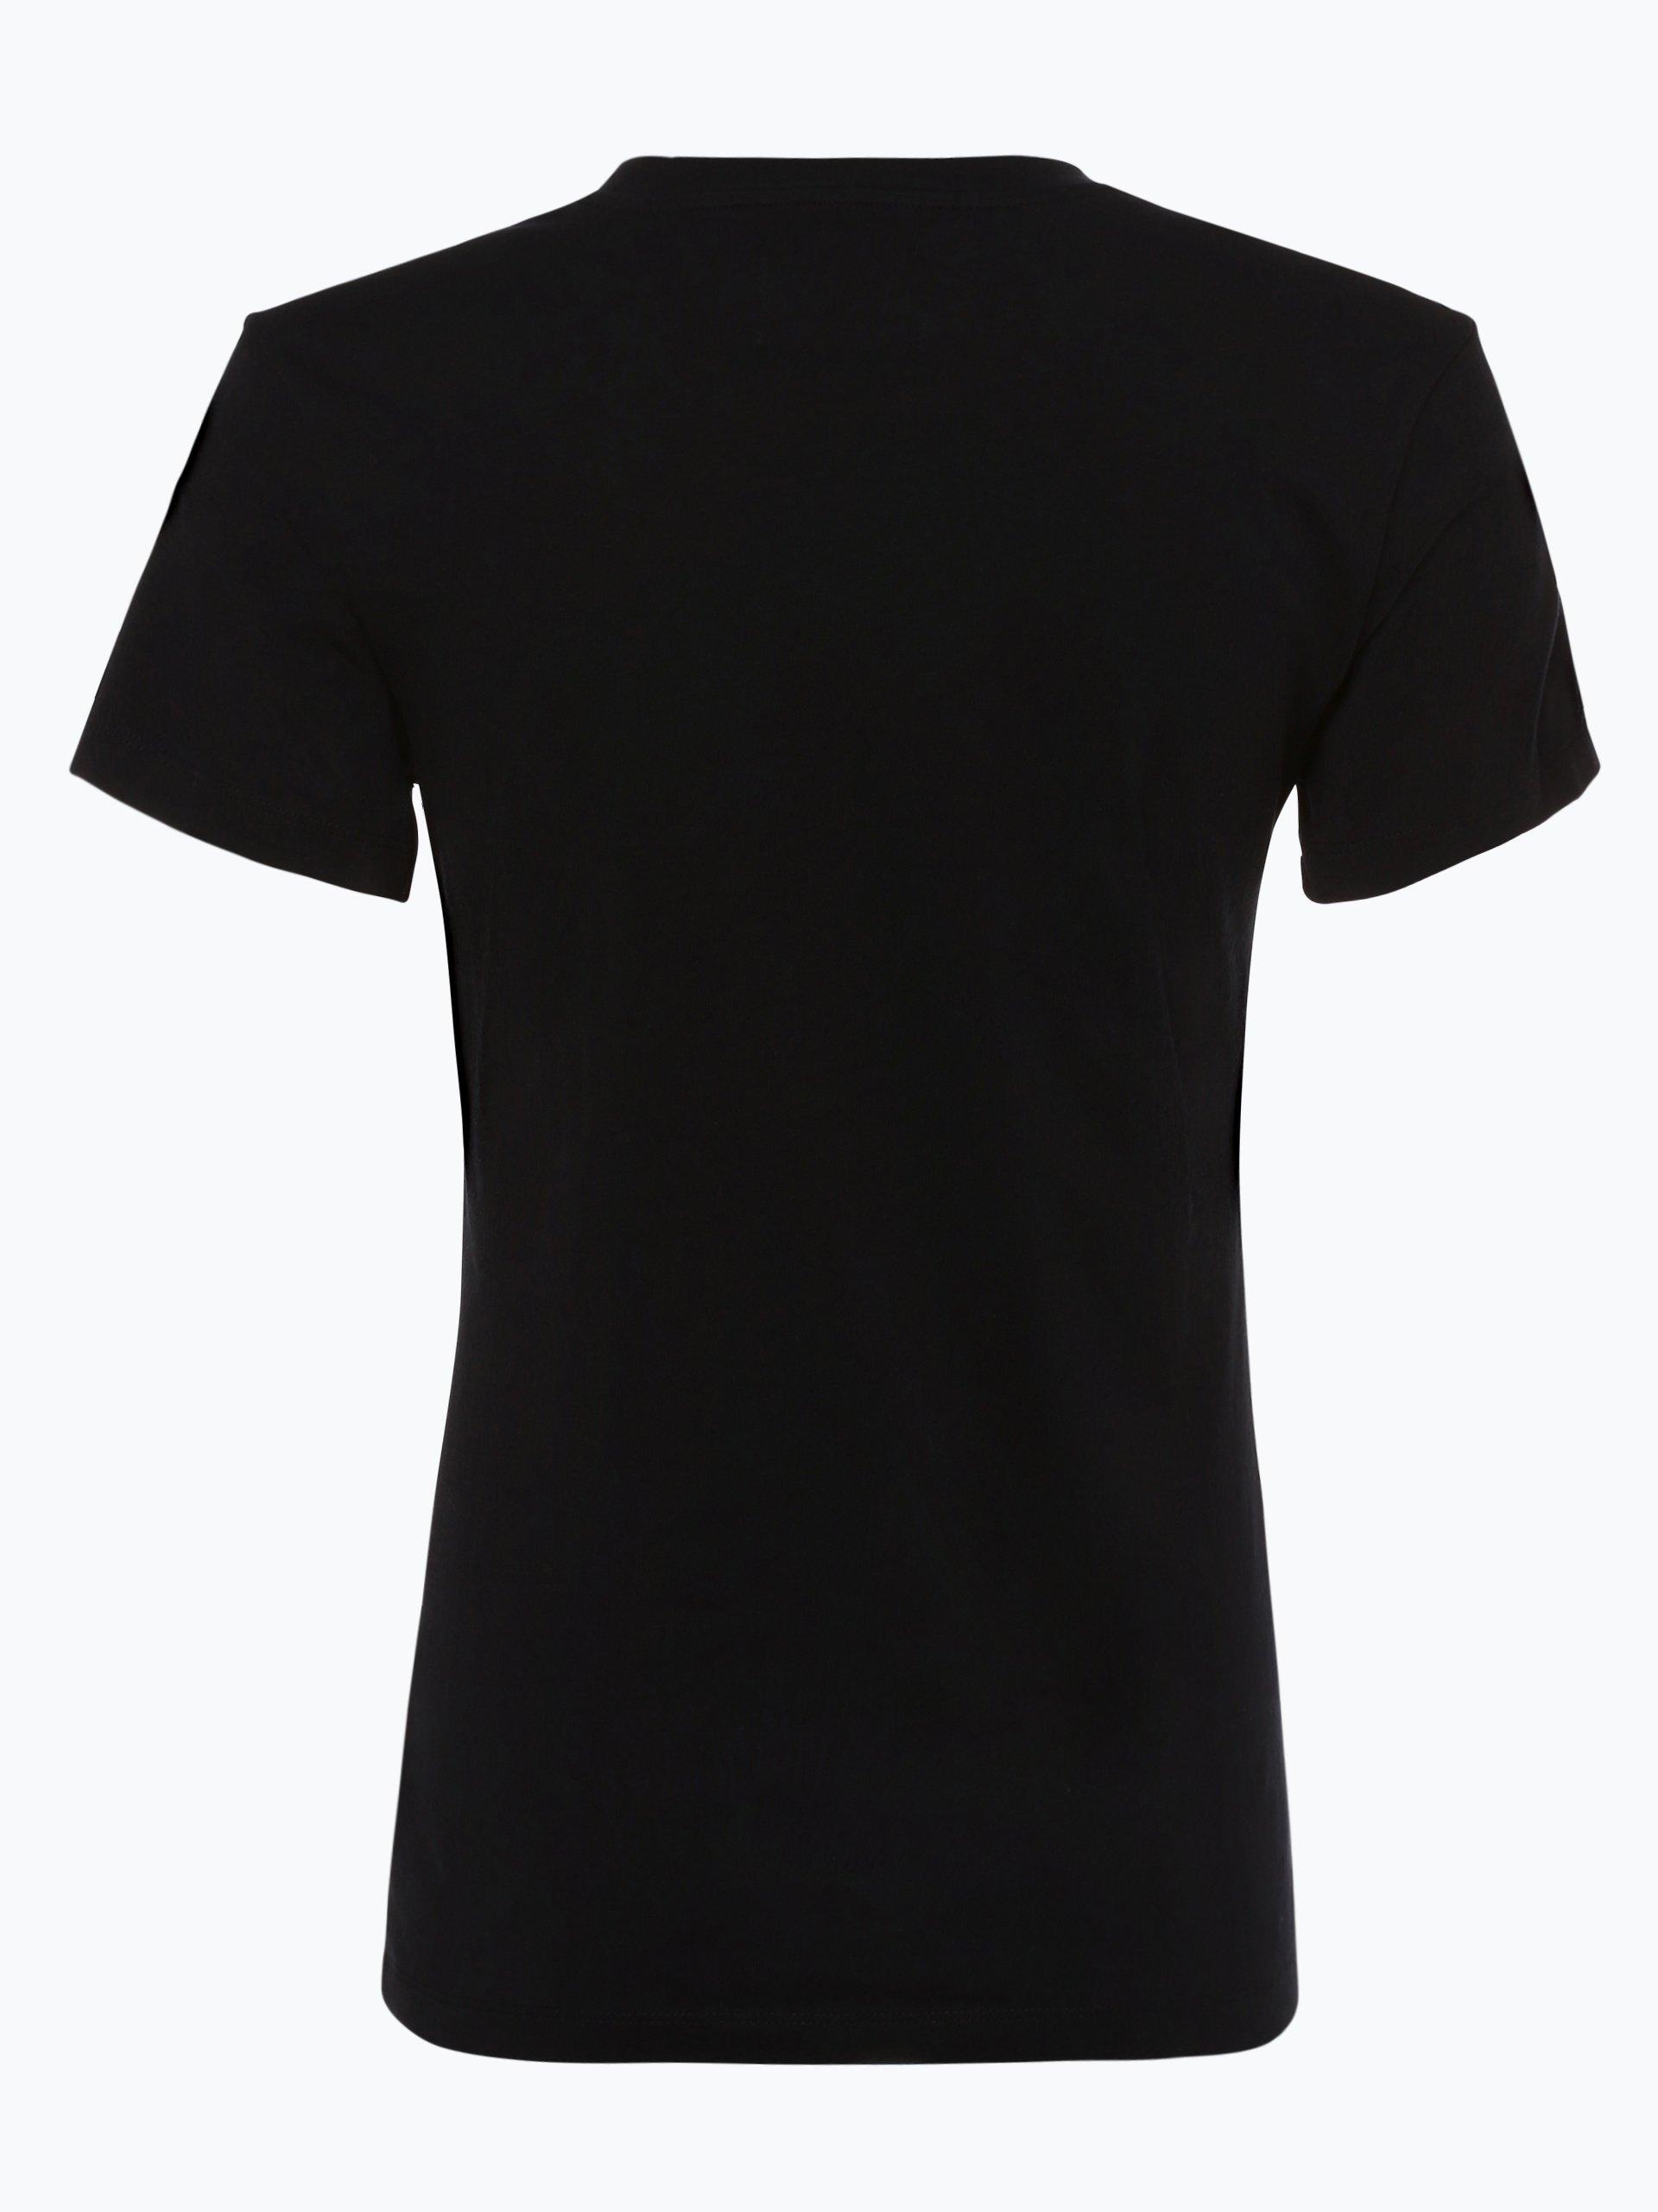 Calvin Klein Jeans Damen T-Shirt - Heather